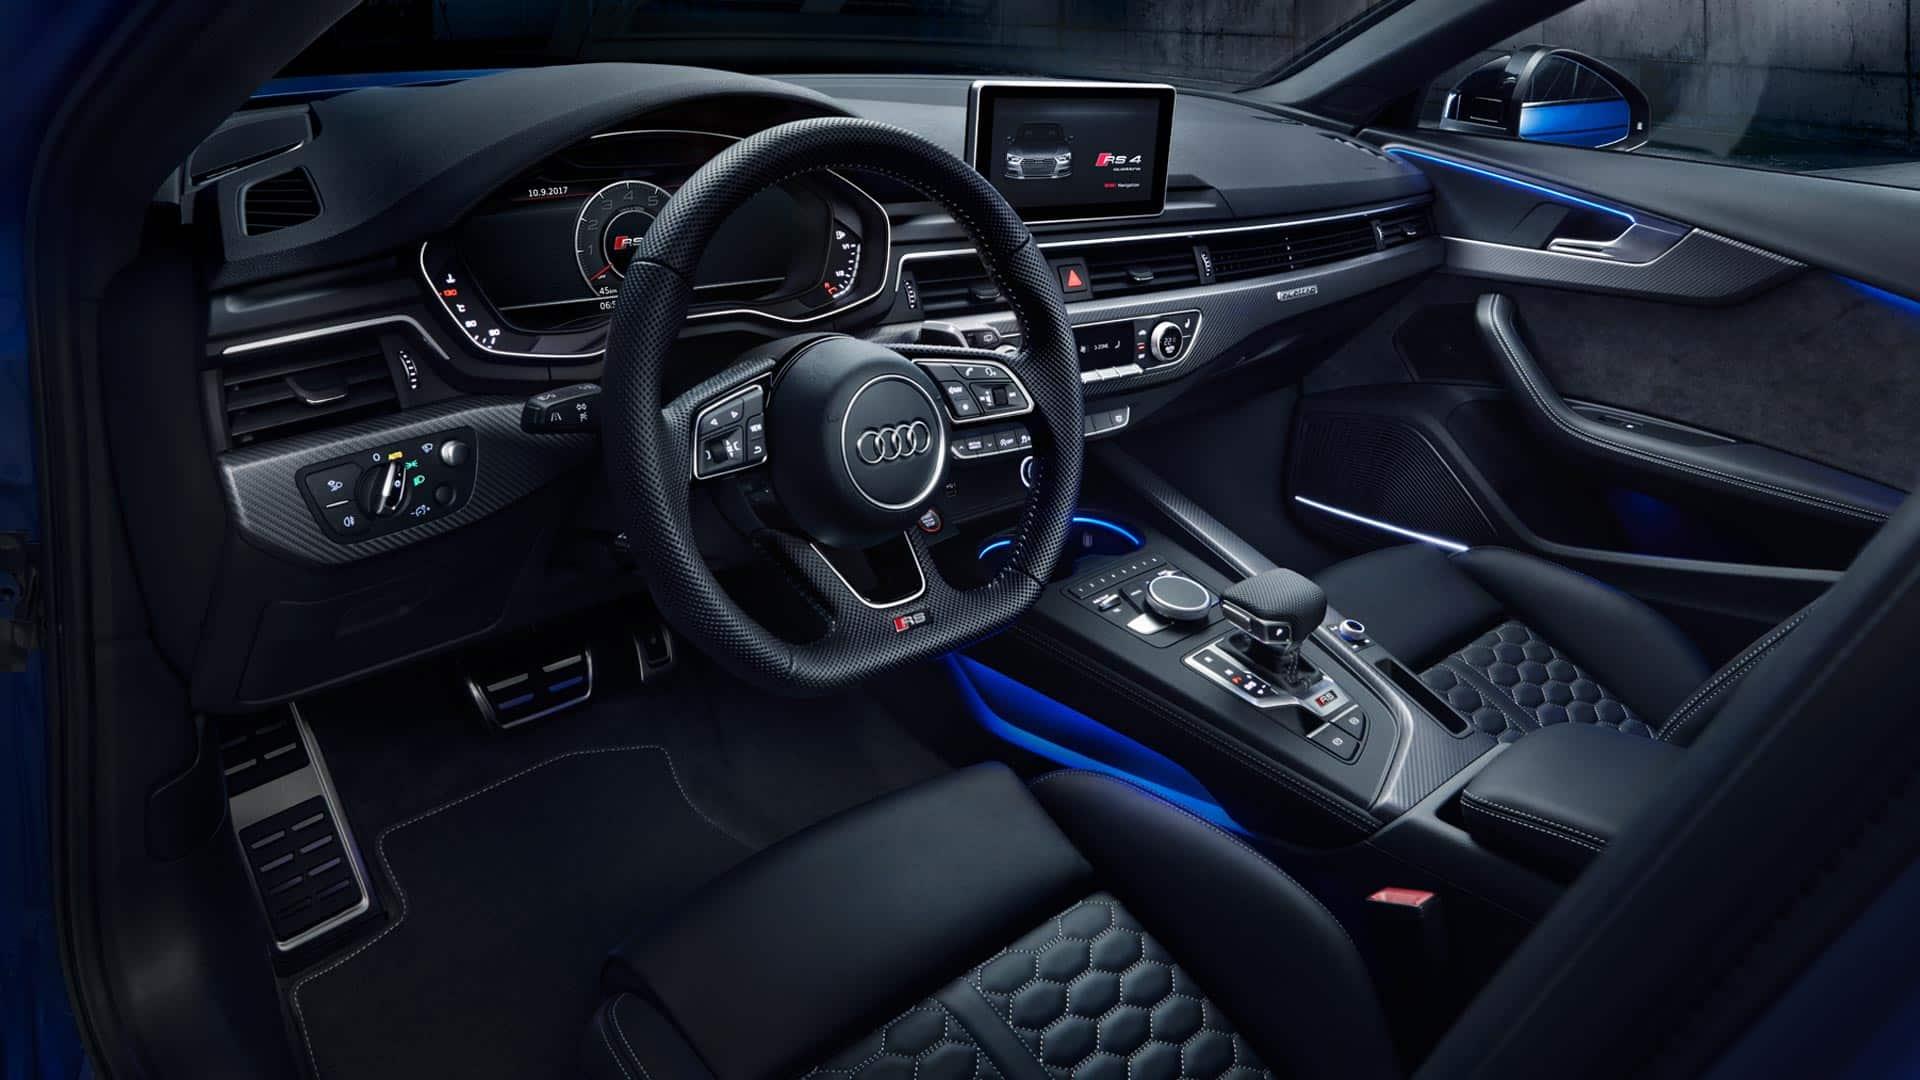 Rs 4 Avant Gt A4 Gt Audi Deutschland